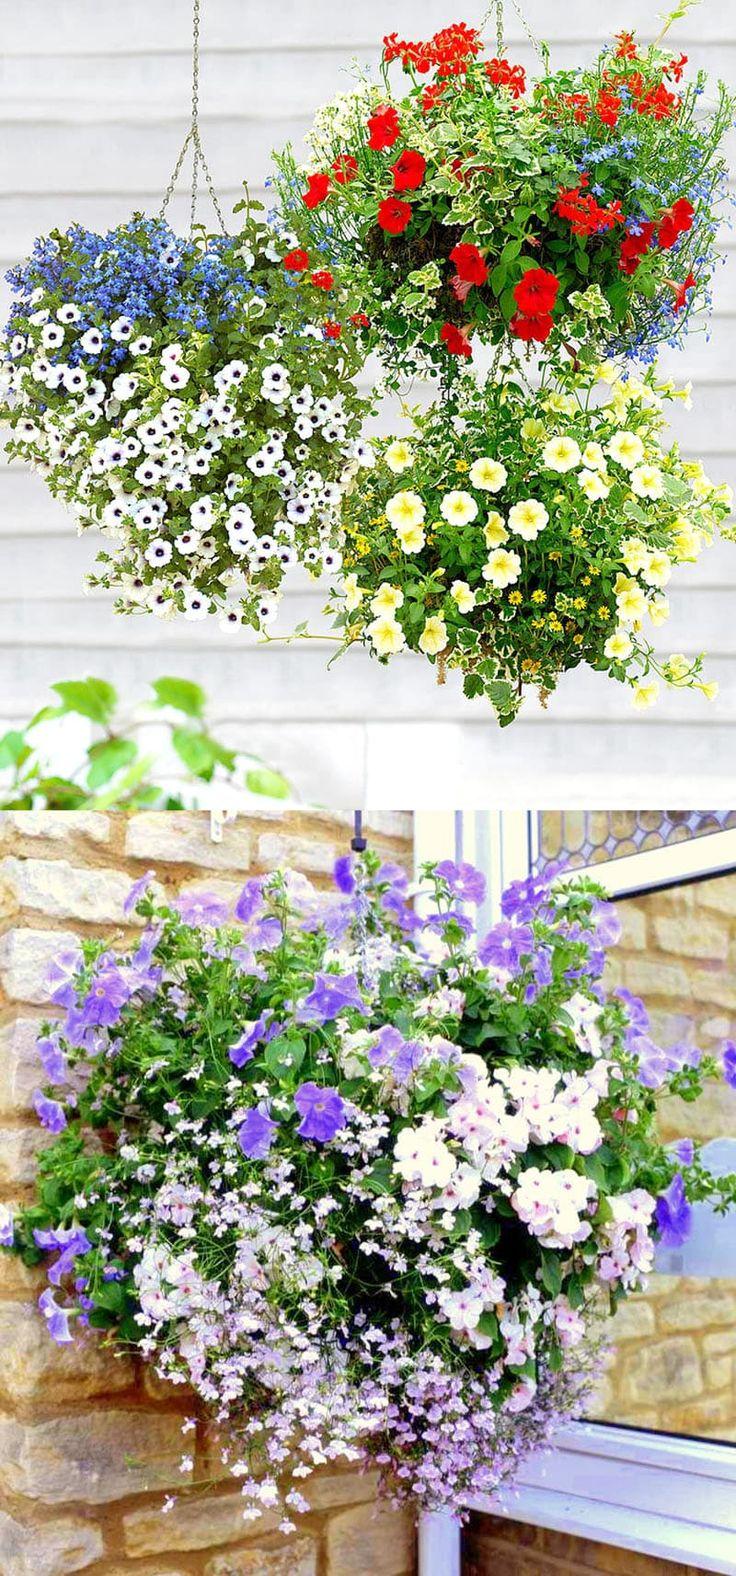 Best 25 Hanging Gardens Ideas On Pinterest Hanging 400 x 300